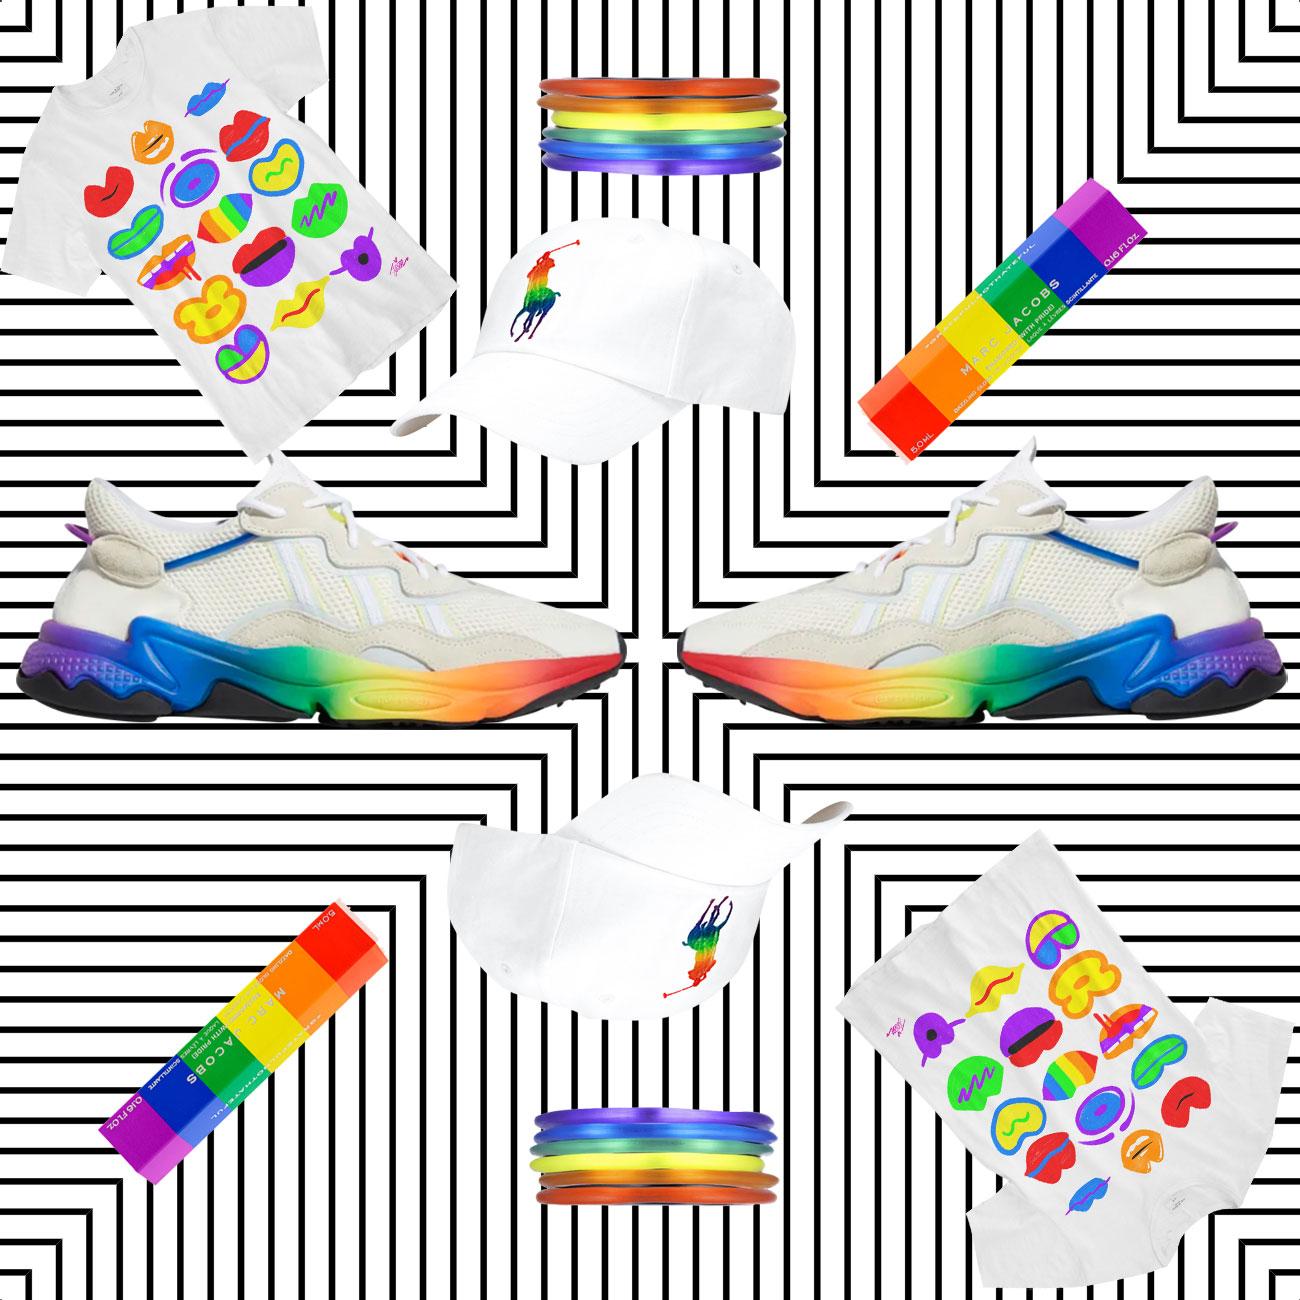 25 Glittery, Rainbowy Ways to Support LGBTQ Rights